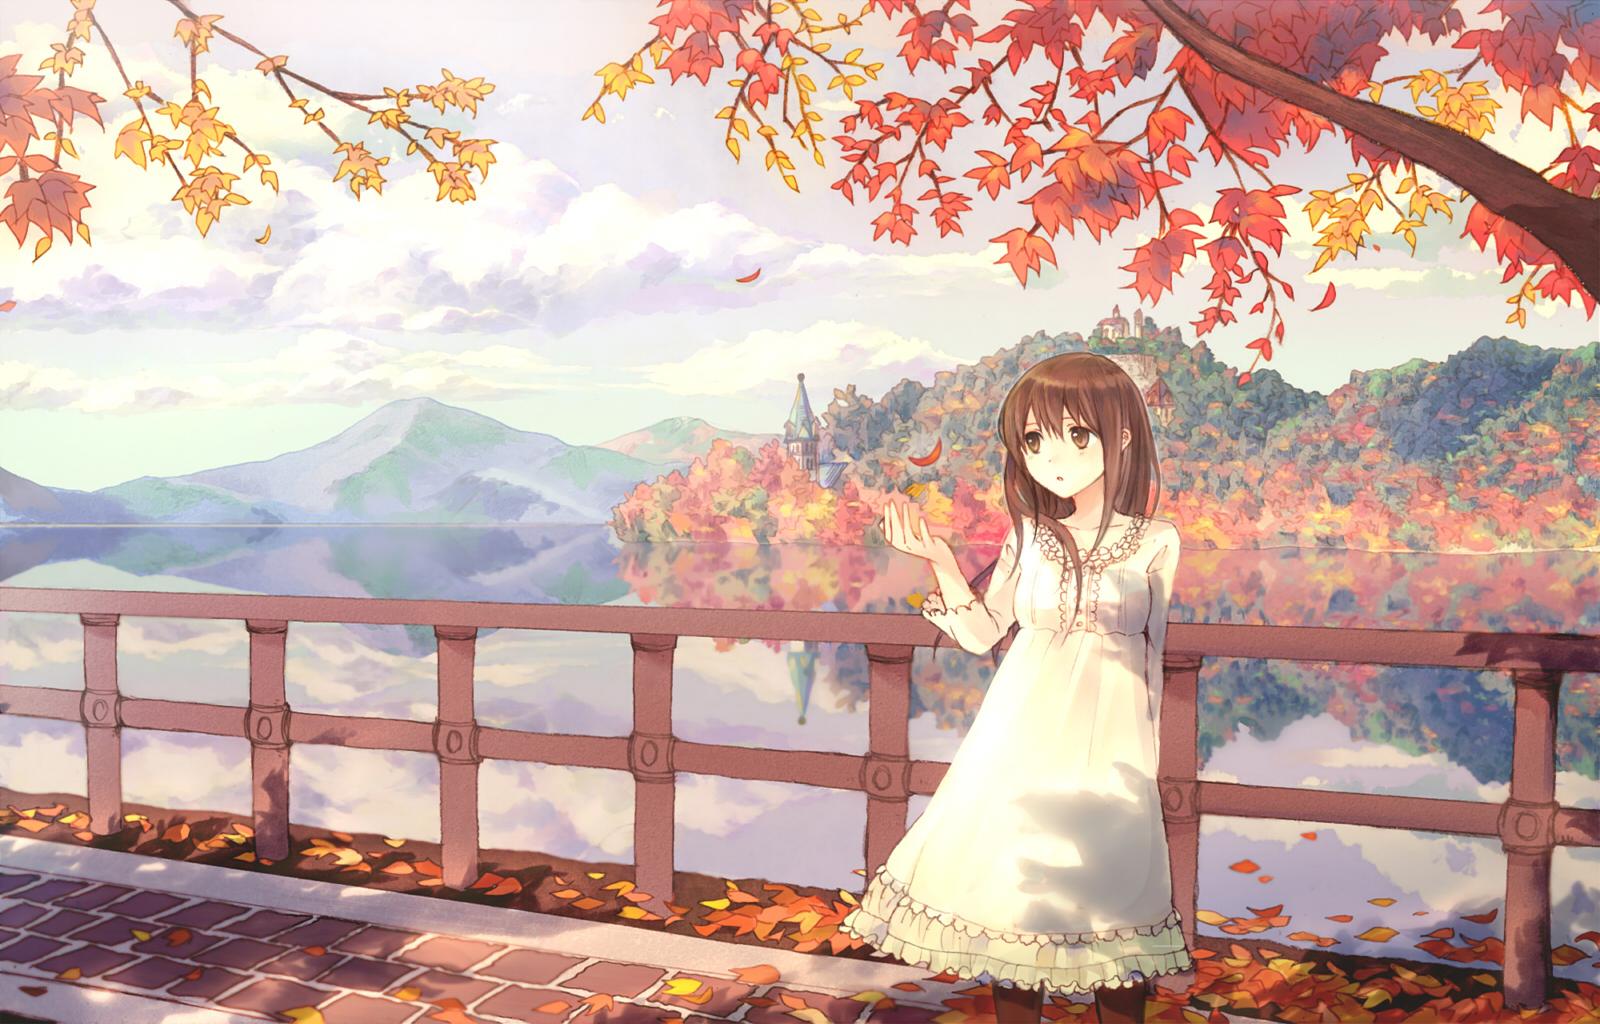 anime couple the melancholy of haruhi suzumiya fall wallpaper 1280x960 1600x1024